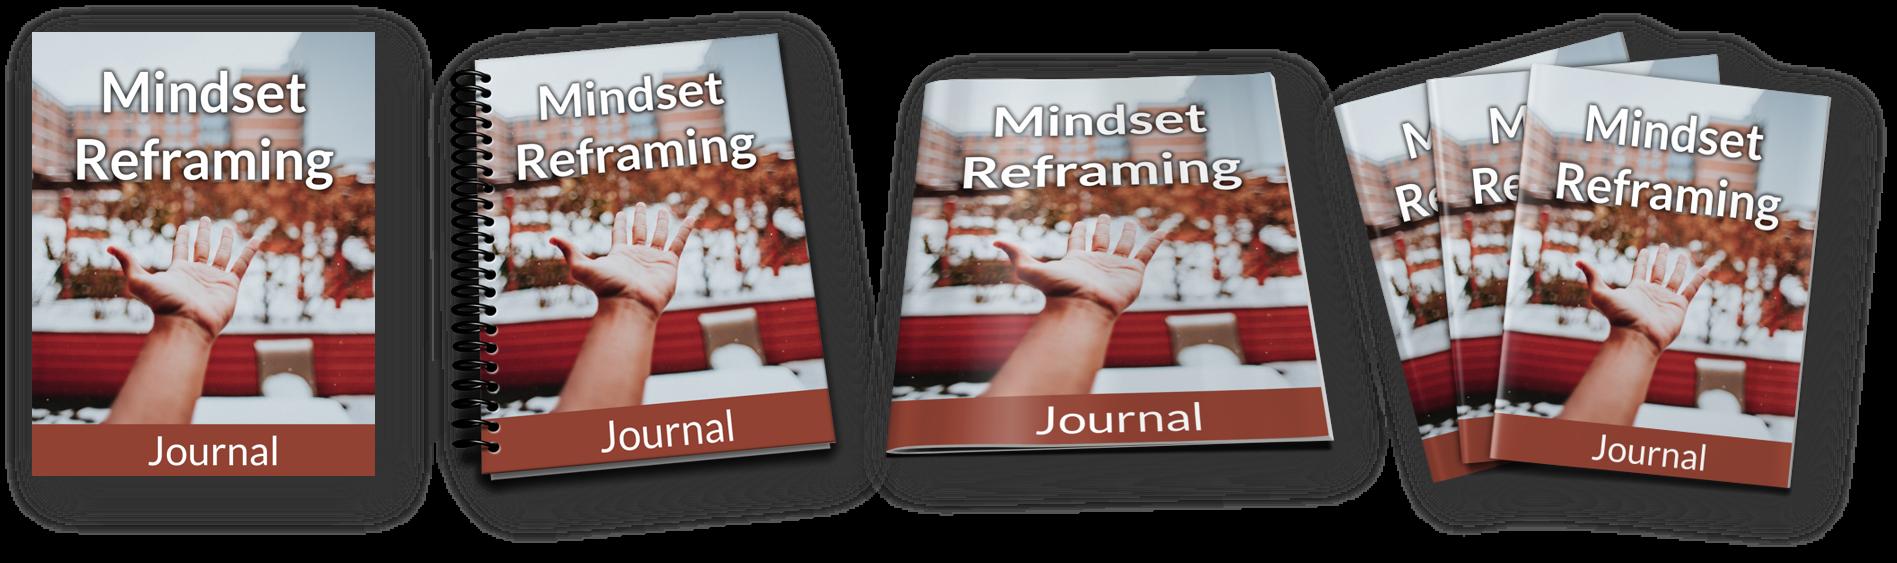 journal-mindset reframing-ecovers